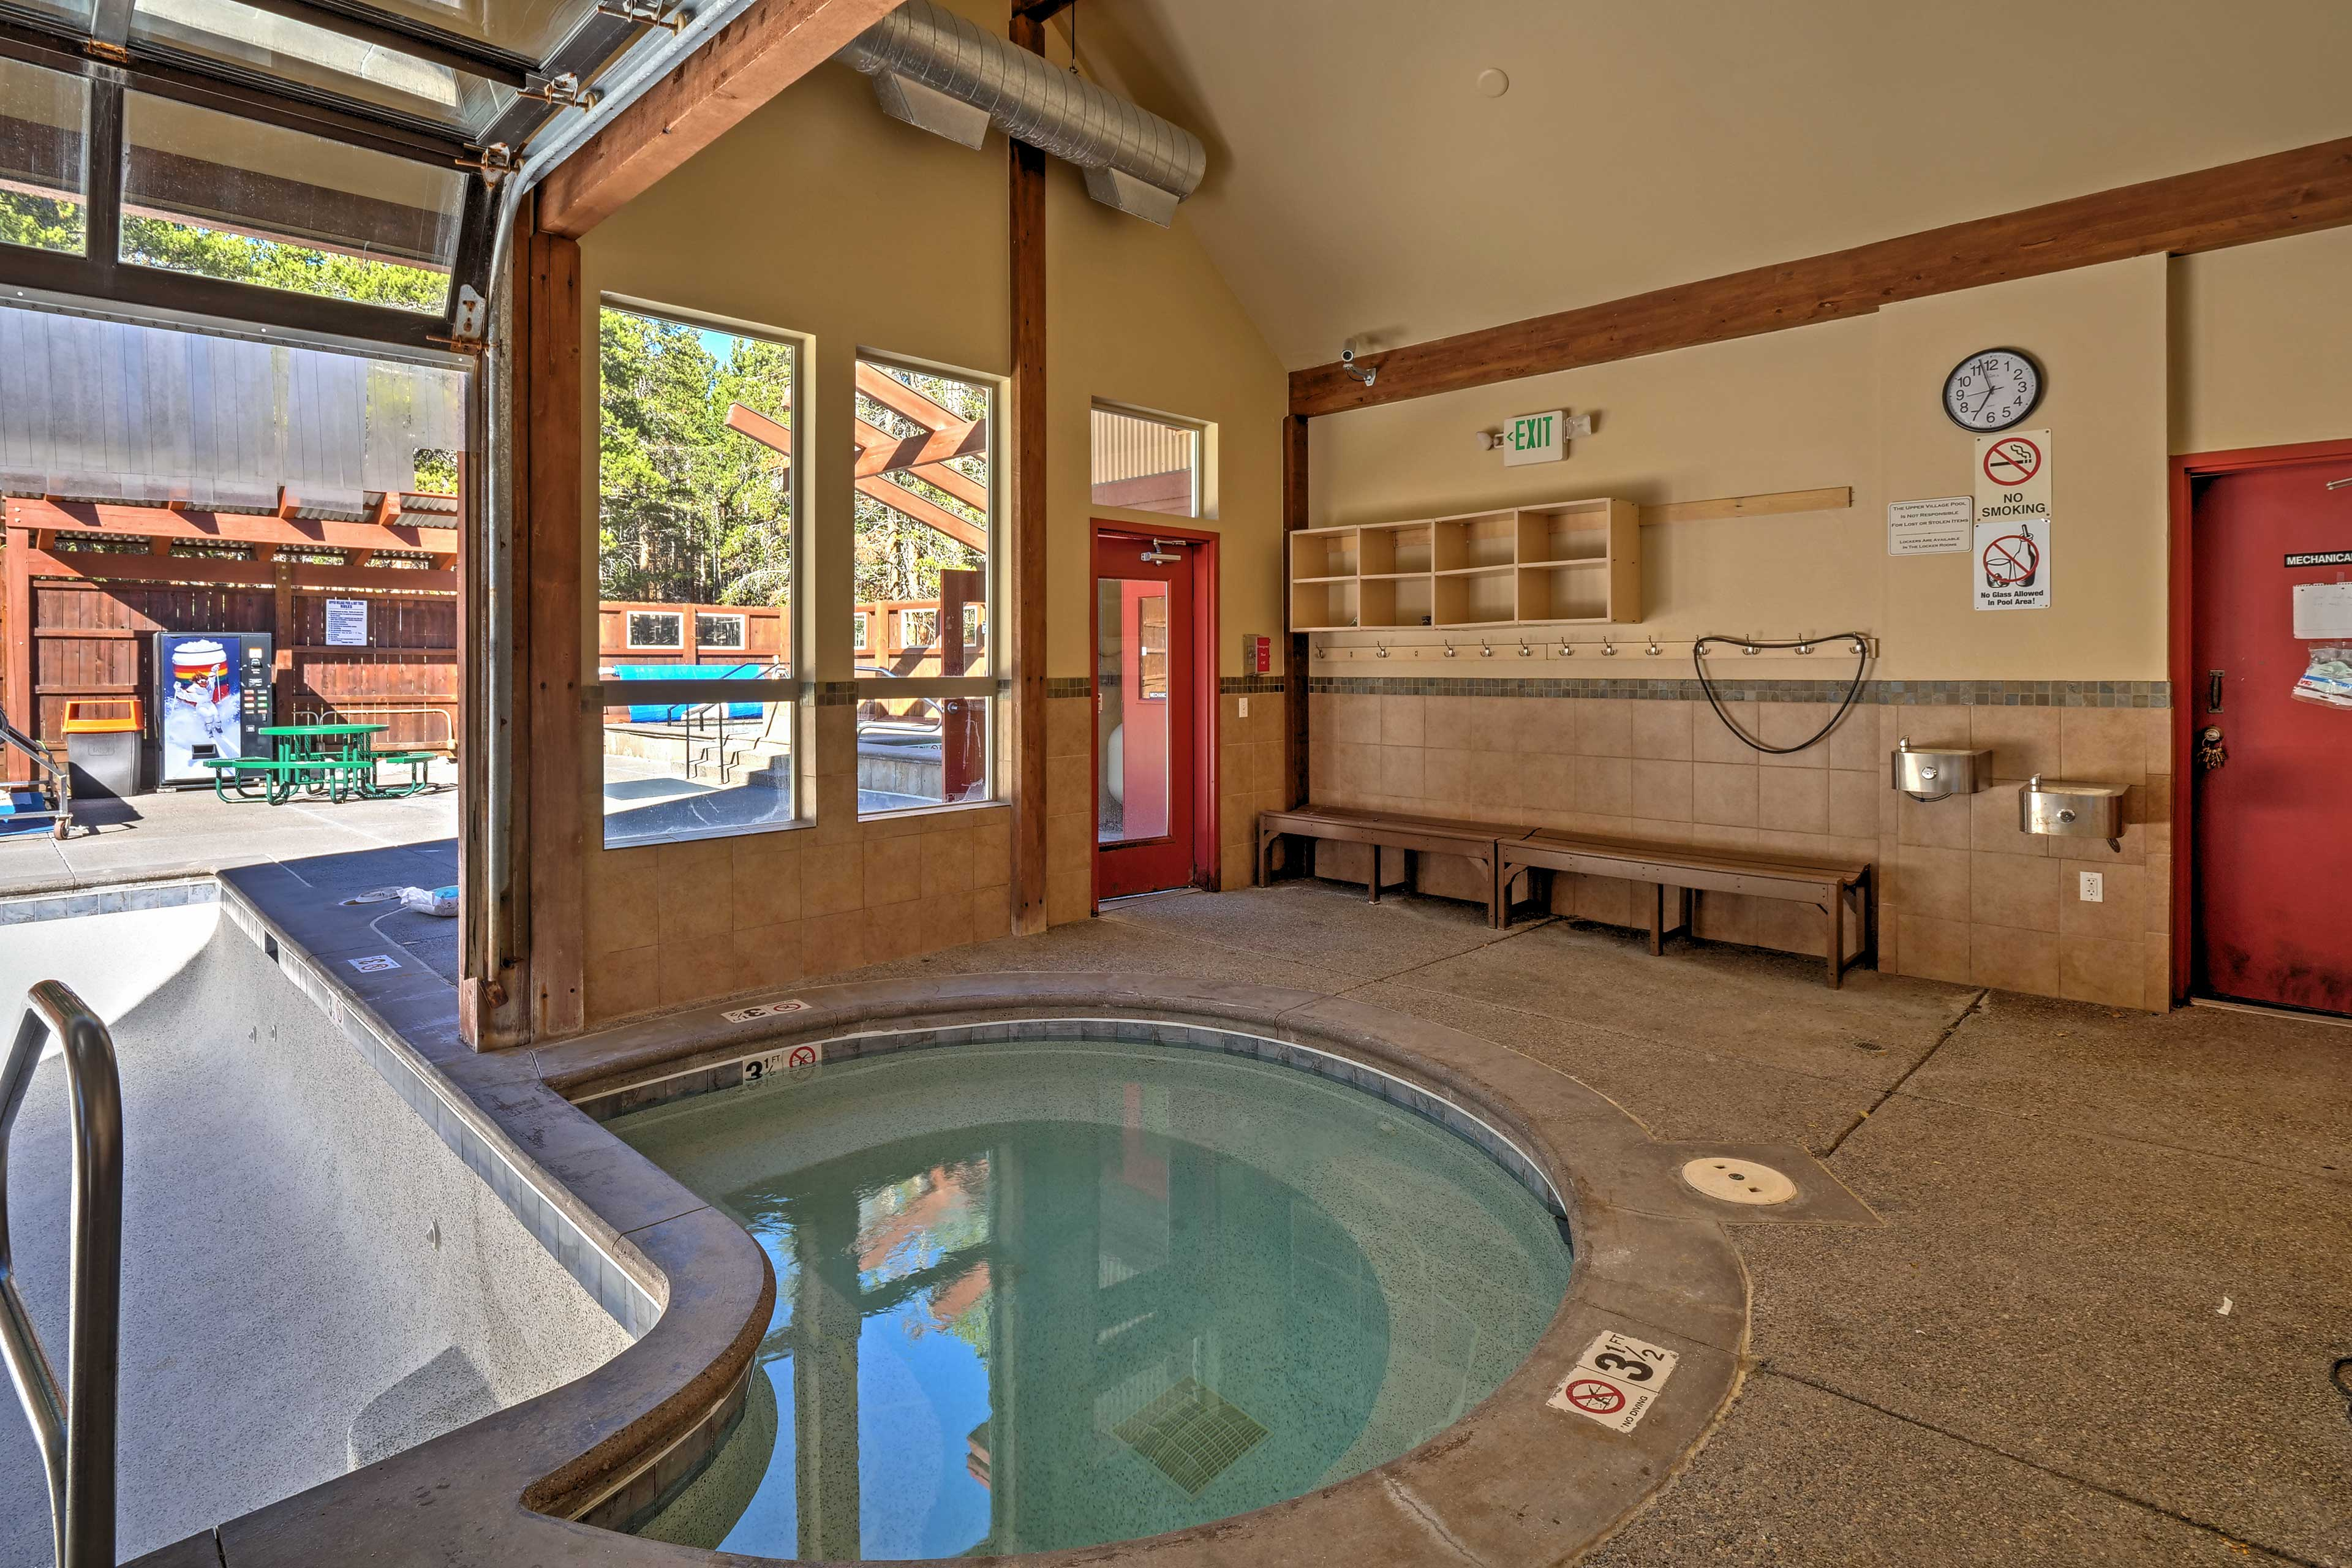 On colder days, enjoy an evening soak in the indoor hot tub.